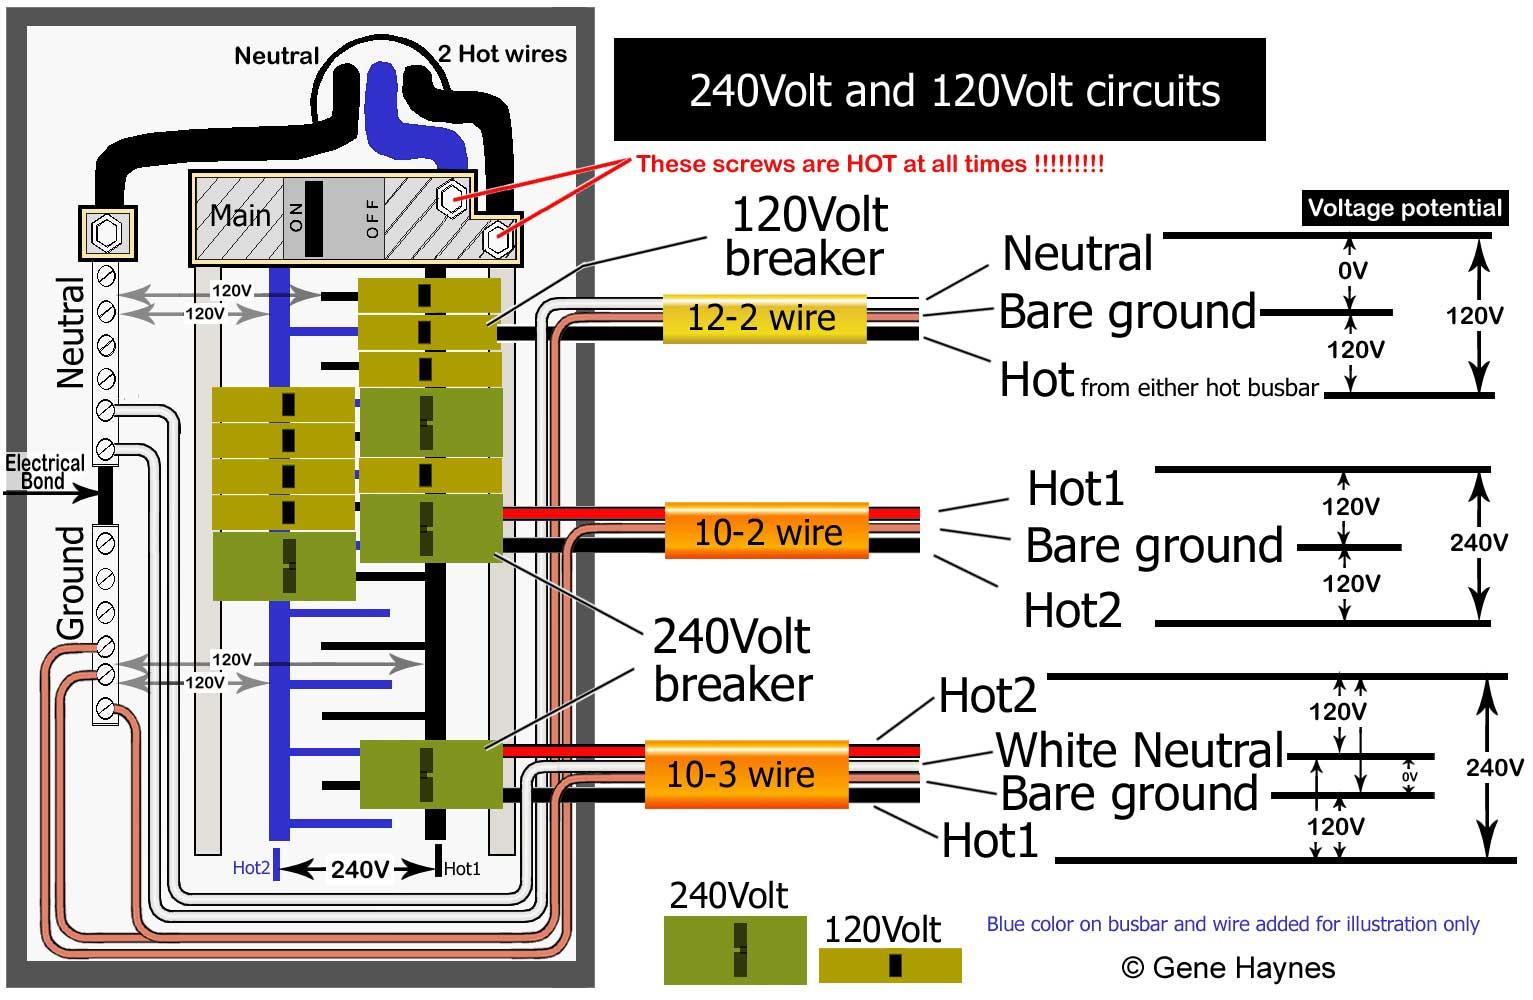 Wiring 240 Vac | Wiring Diagram - 240 Volt Plug Wiring Diagram